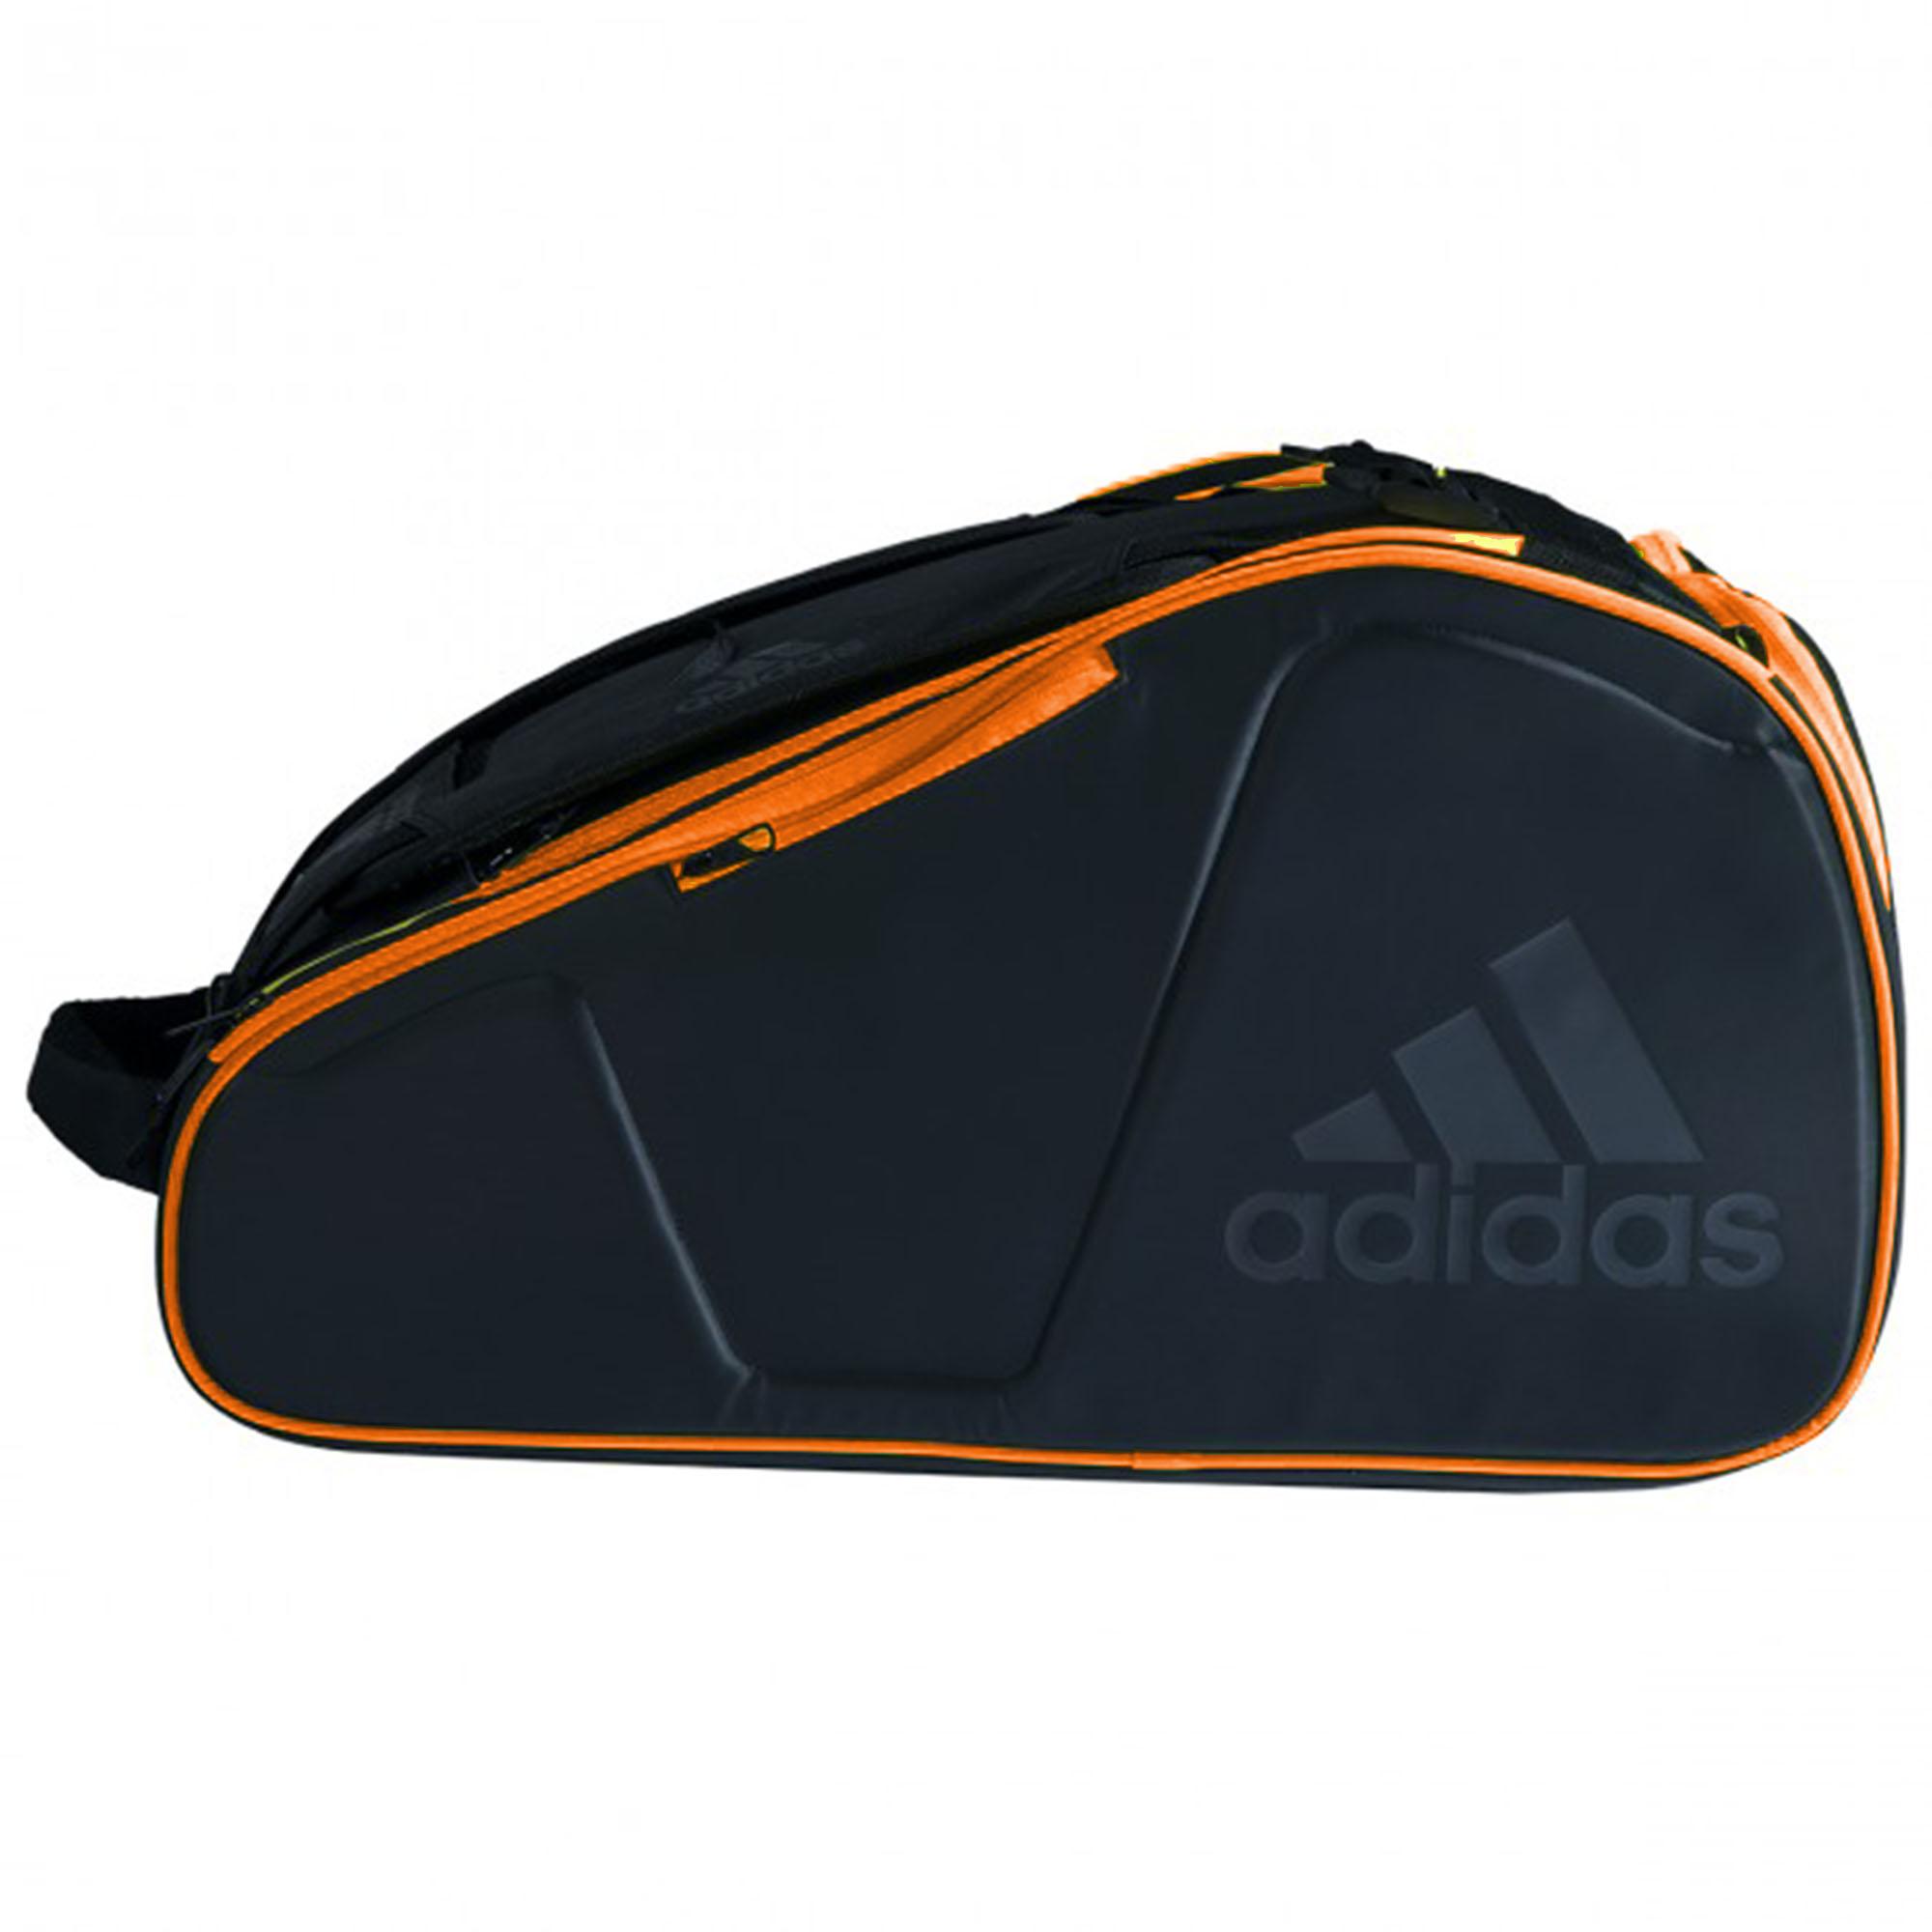 Raqueteira de Padel e Beach Tennis Racket Bag Pro Tour - Adidas